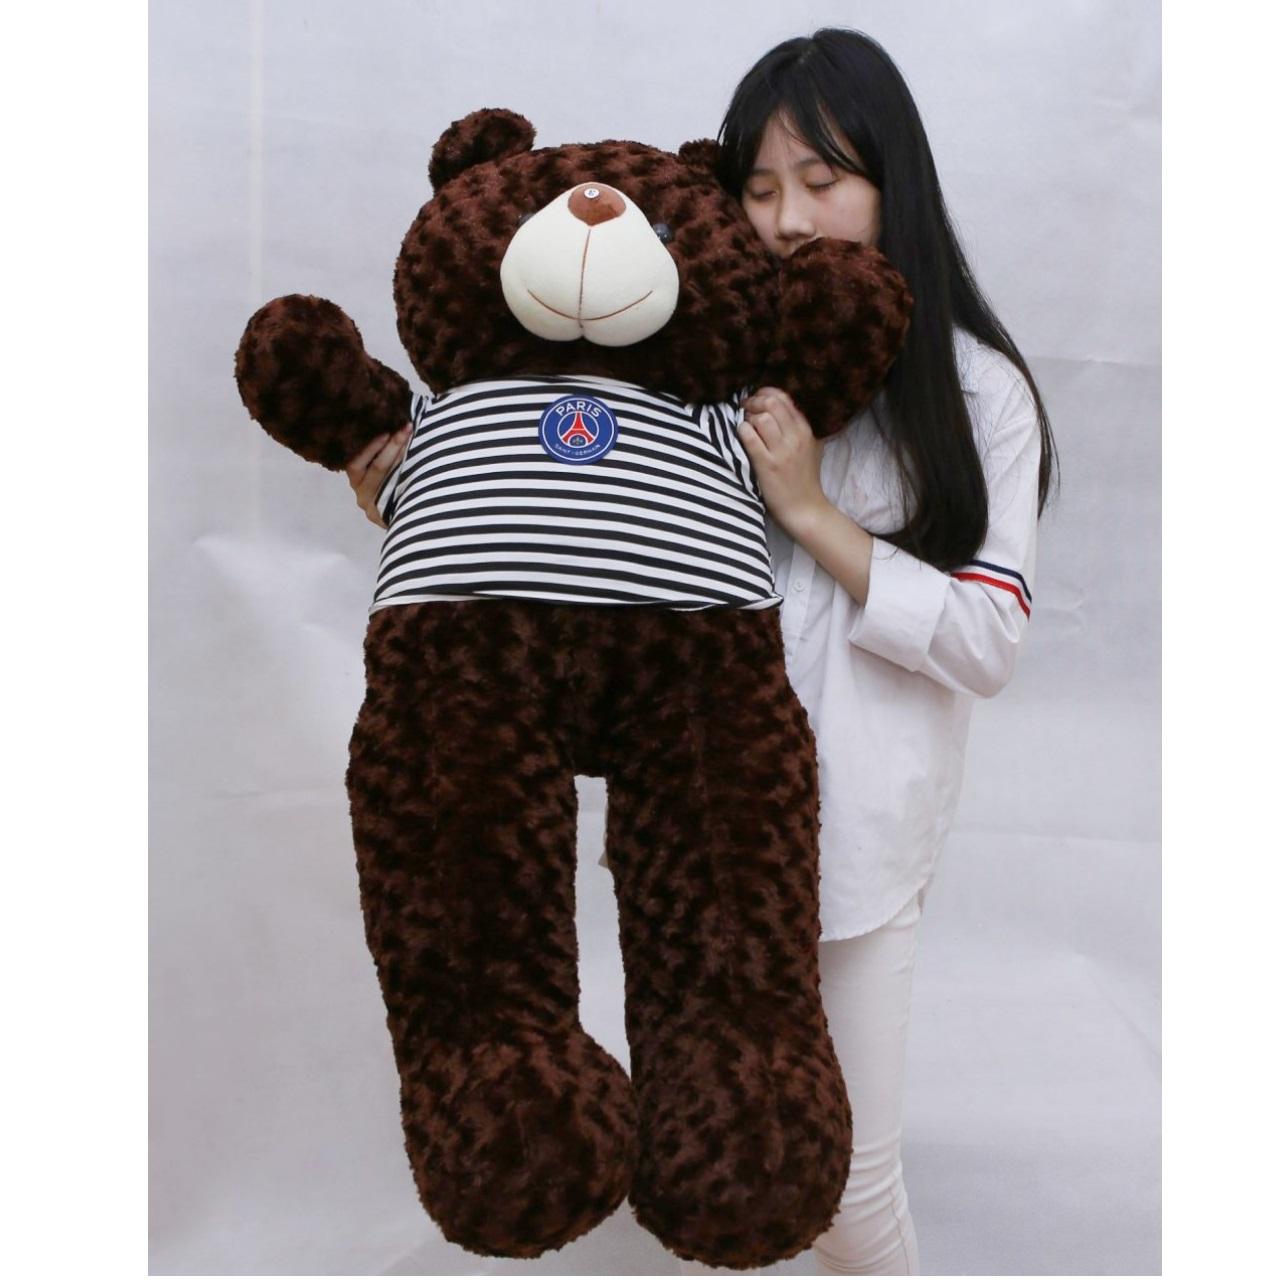 Gấu bông gấu teddy Khổ vải 1m4 cao 1m2